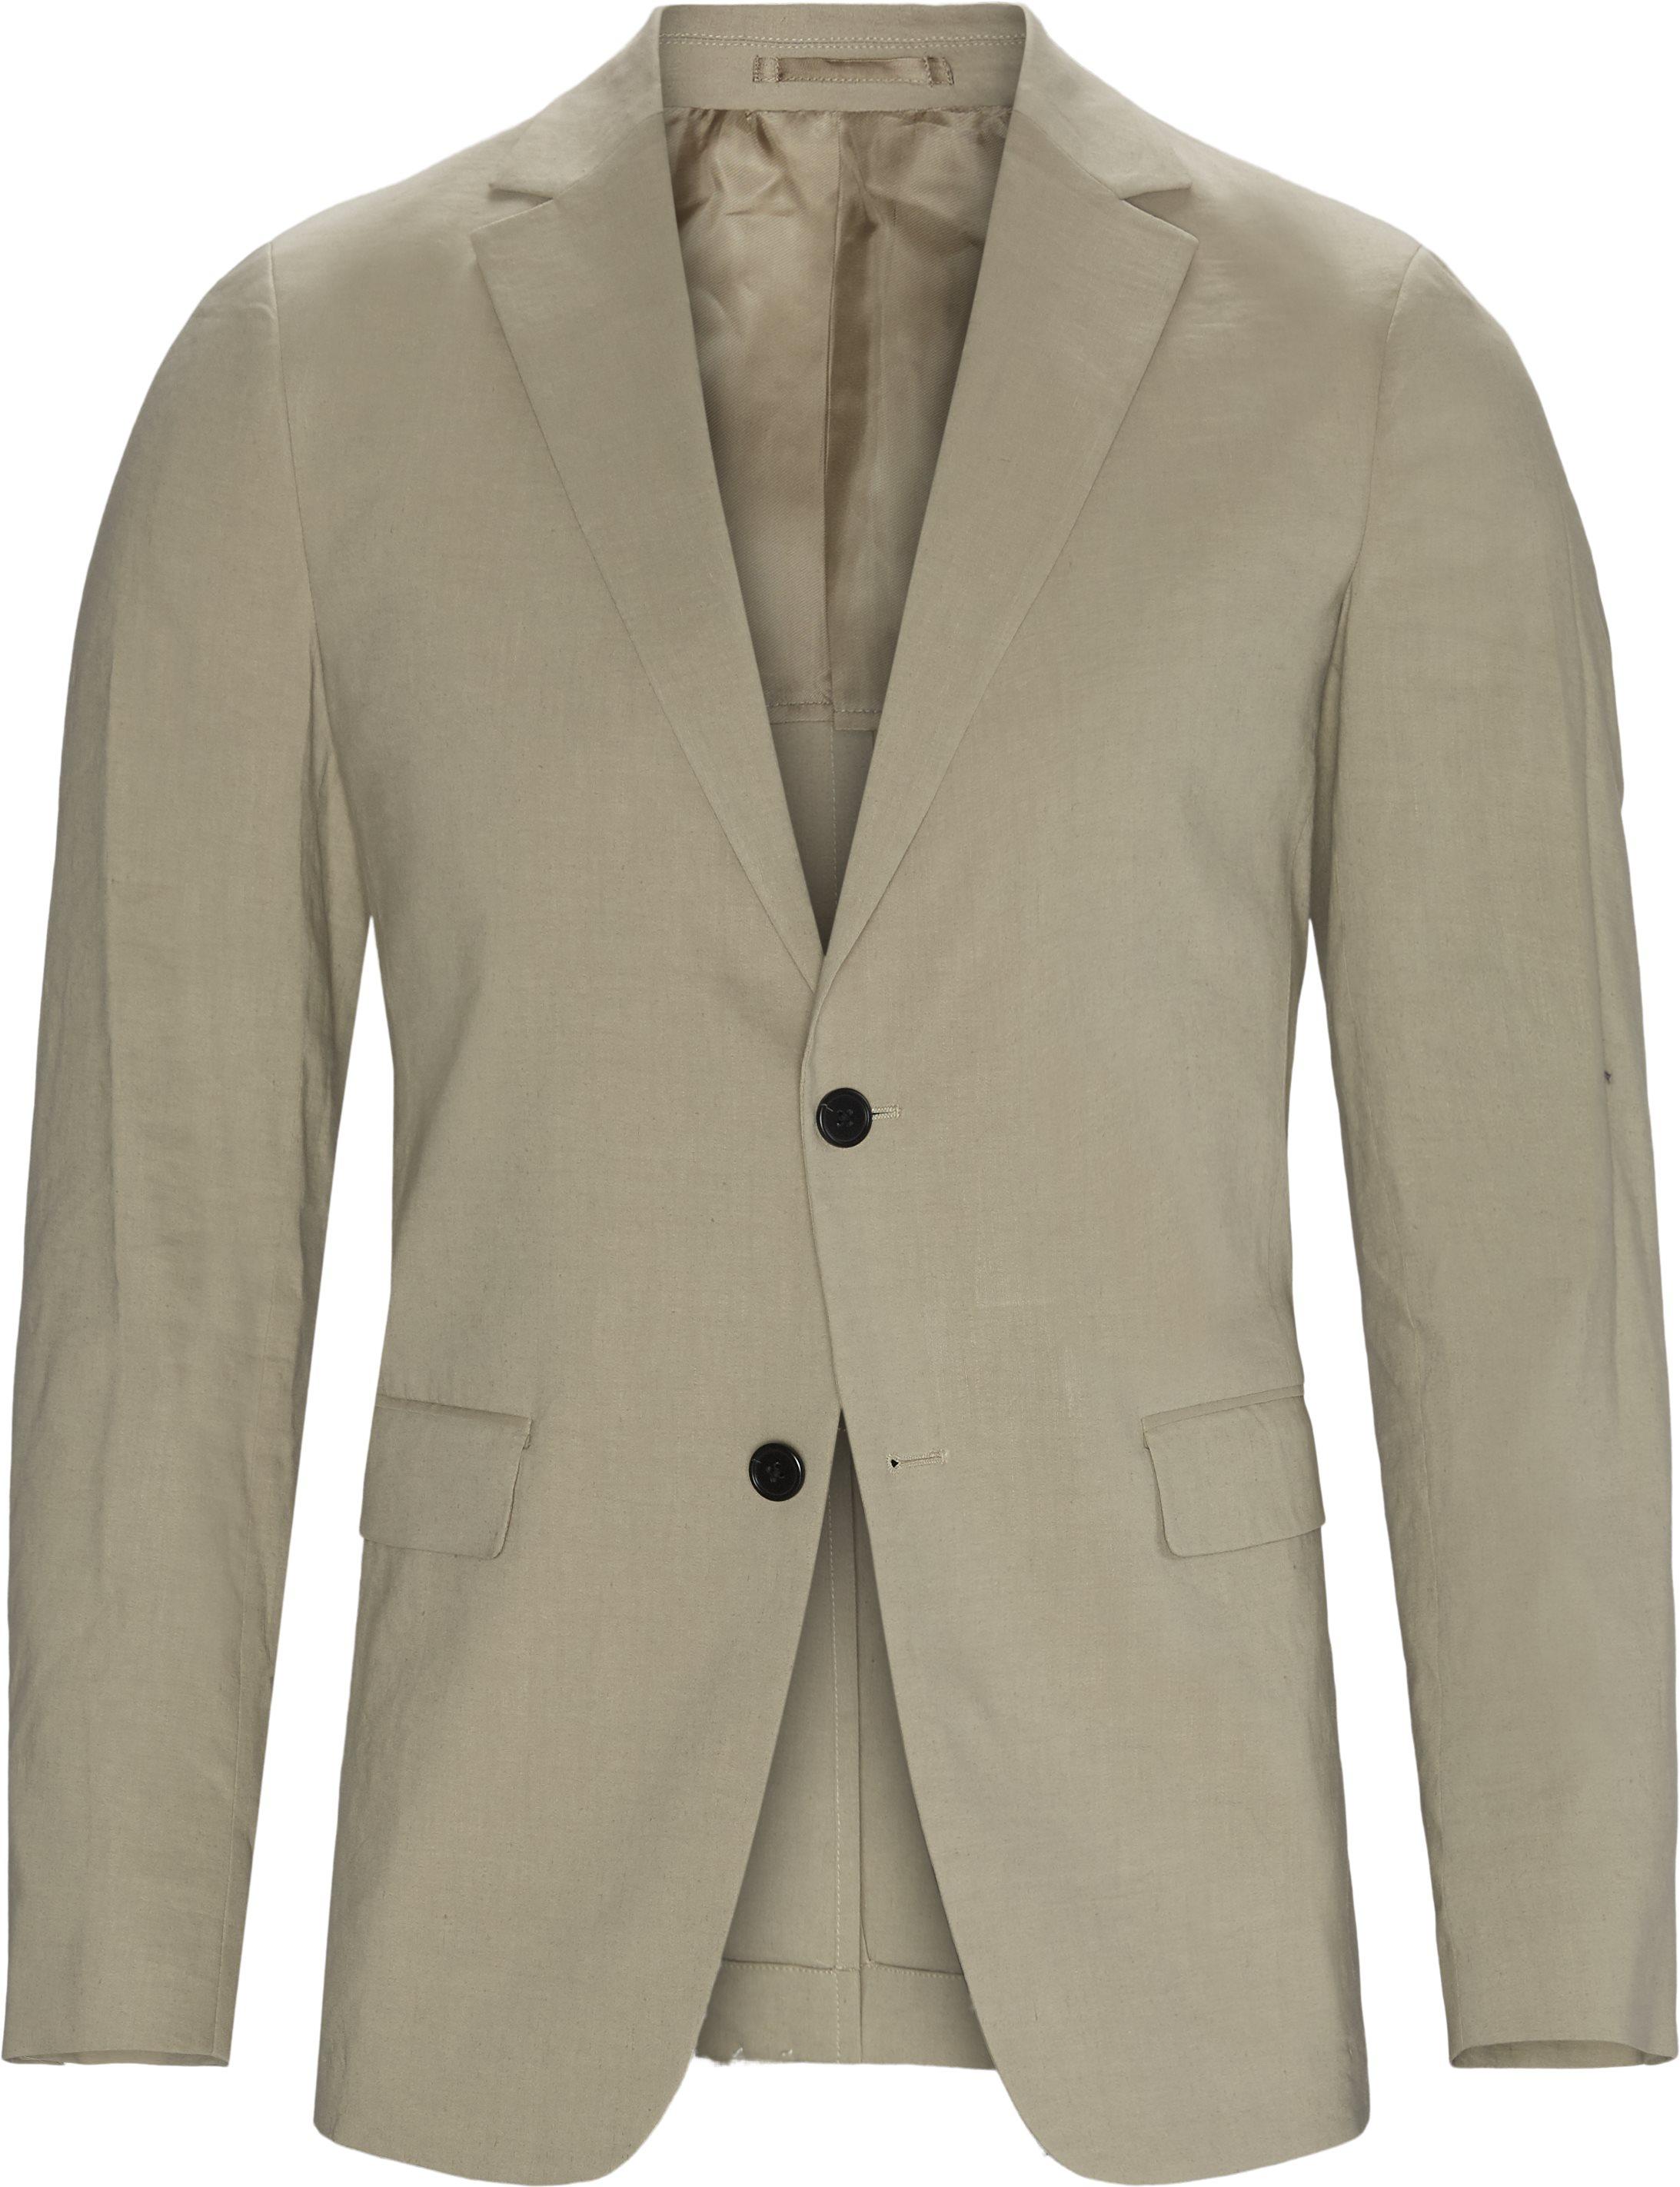 Suits - Regular slim fit - Sand